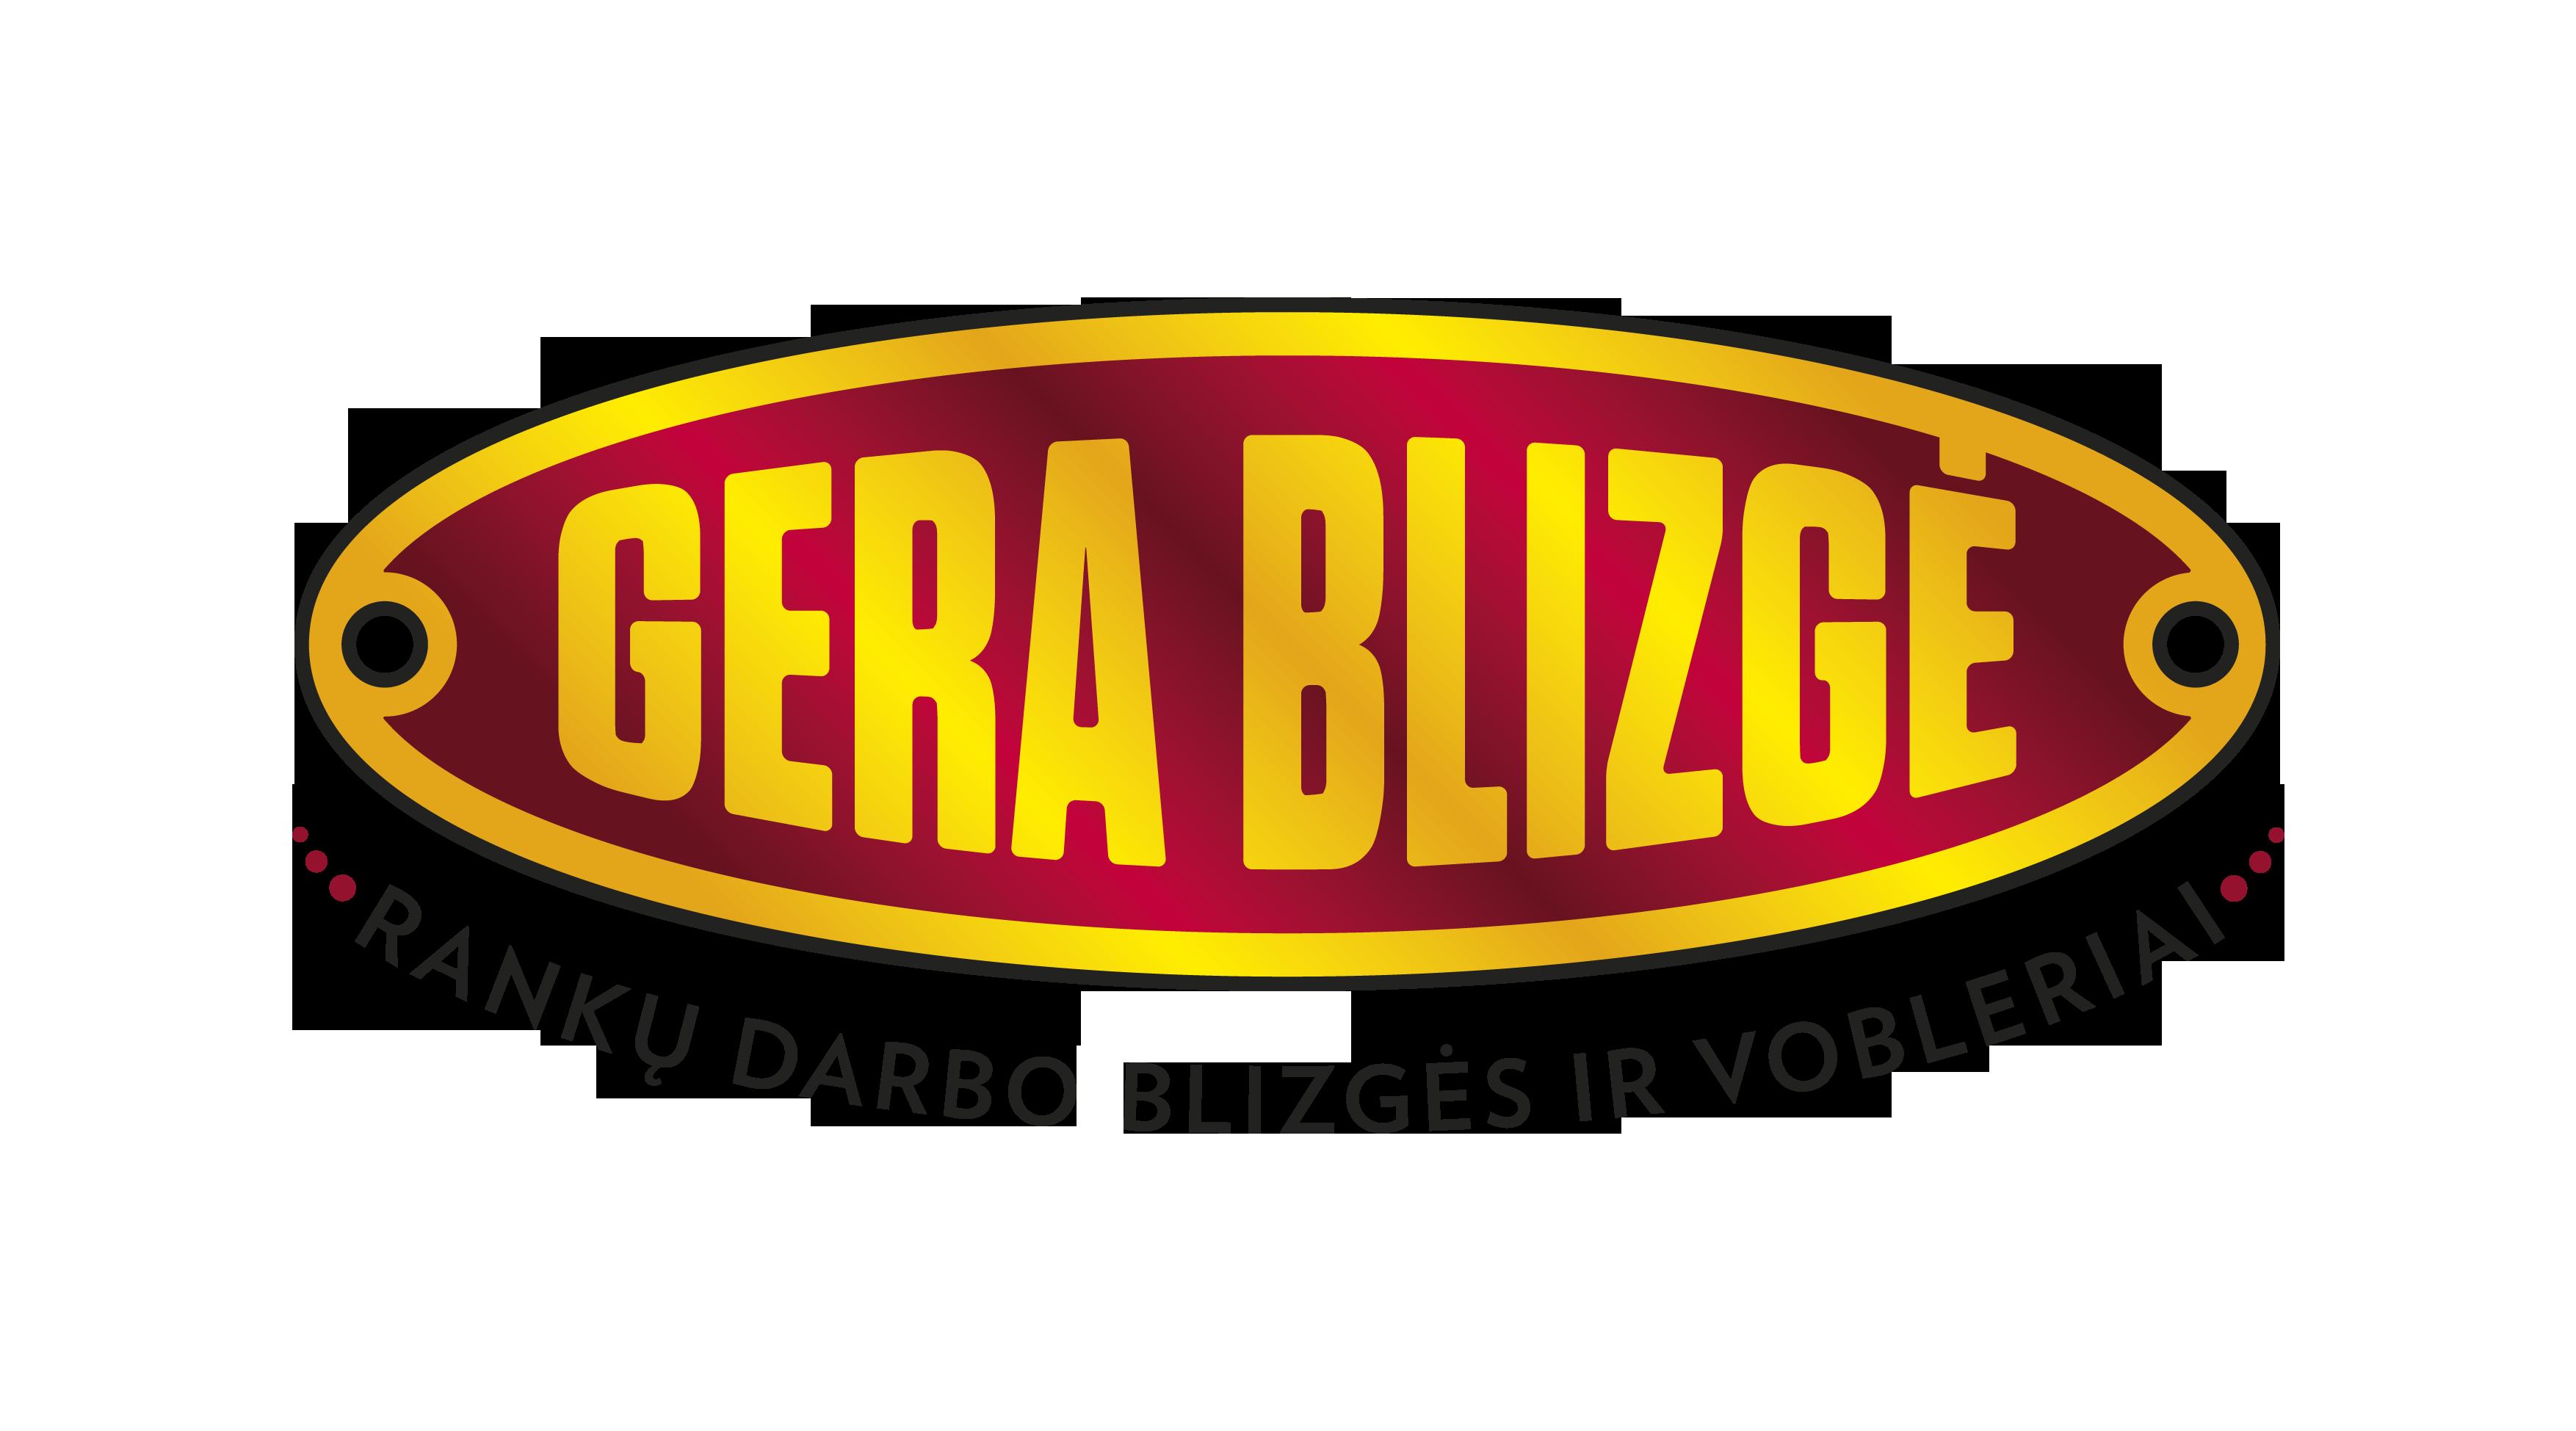 Gera_blizge-gradient